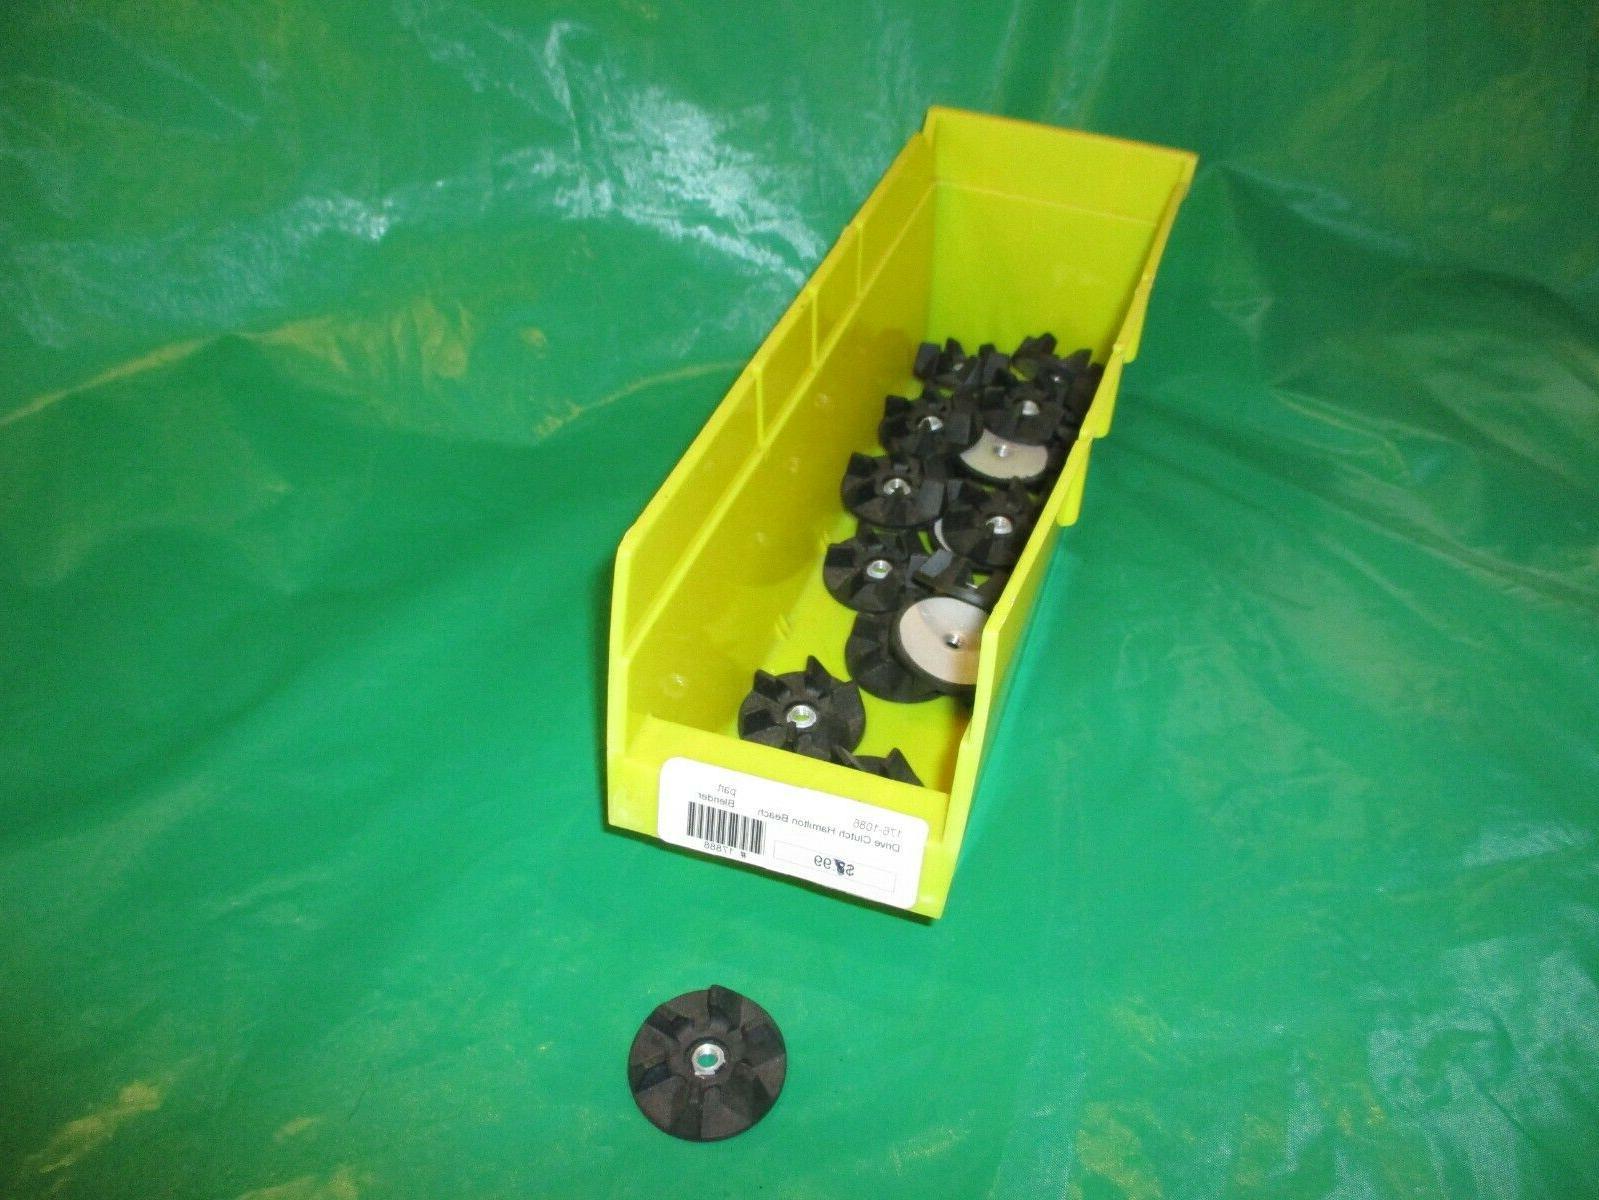 176 1086 parts and accessories blender hamilton